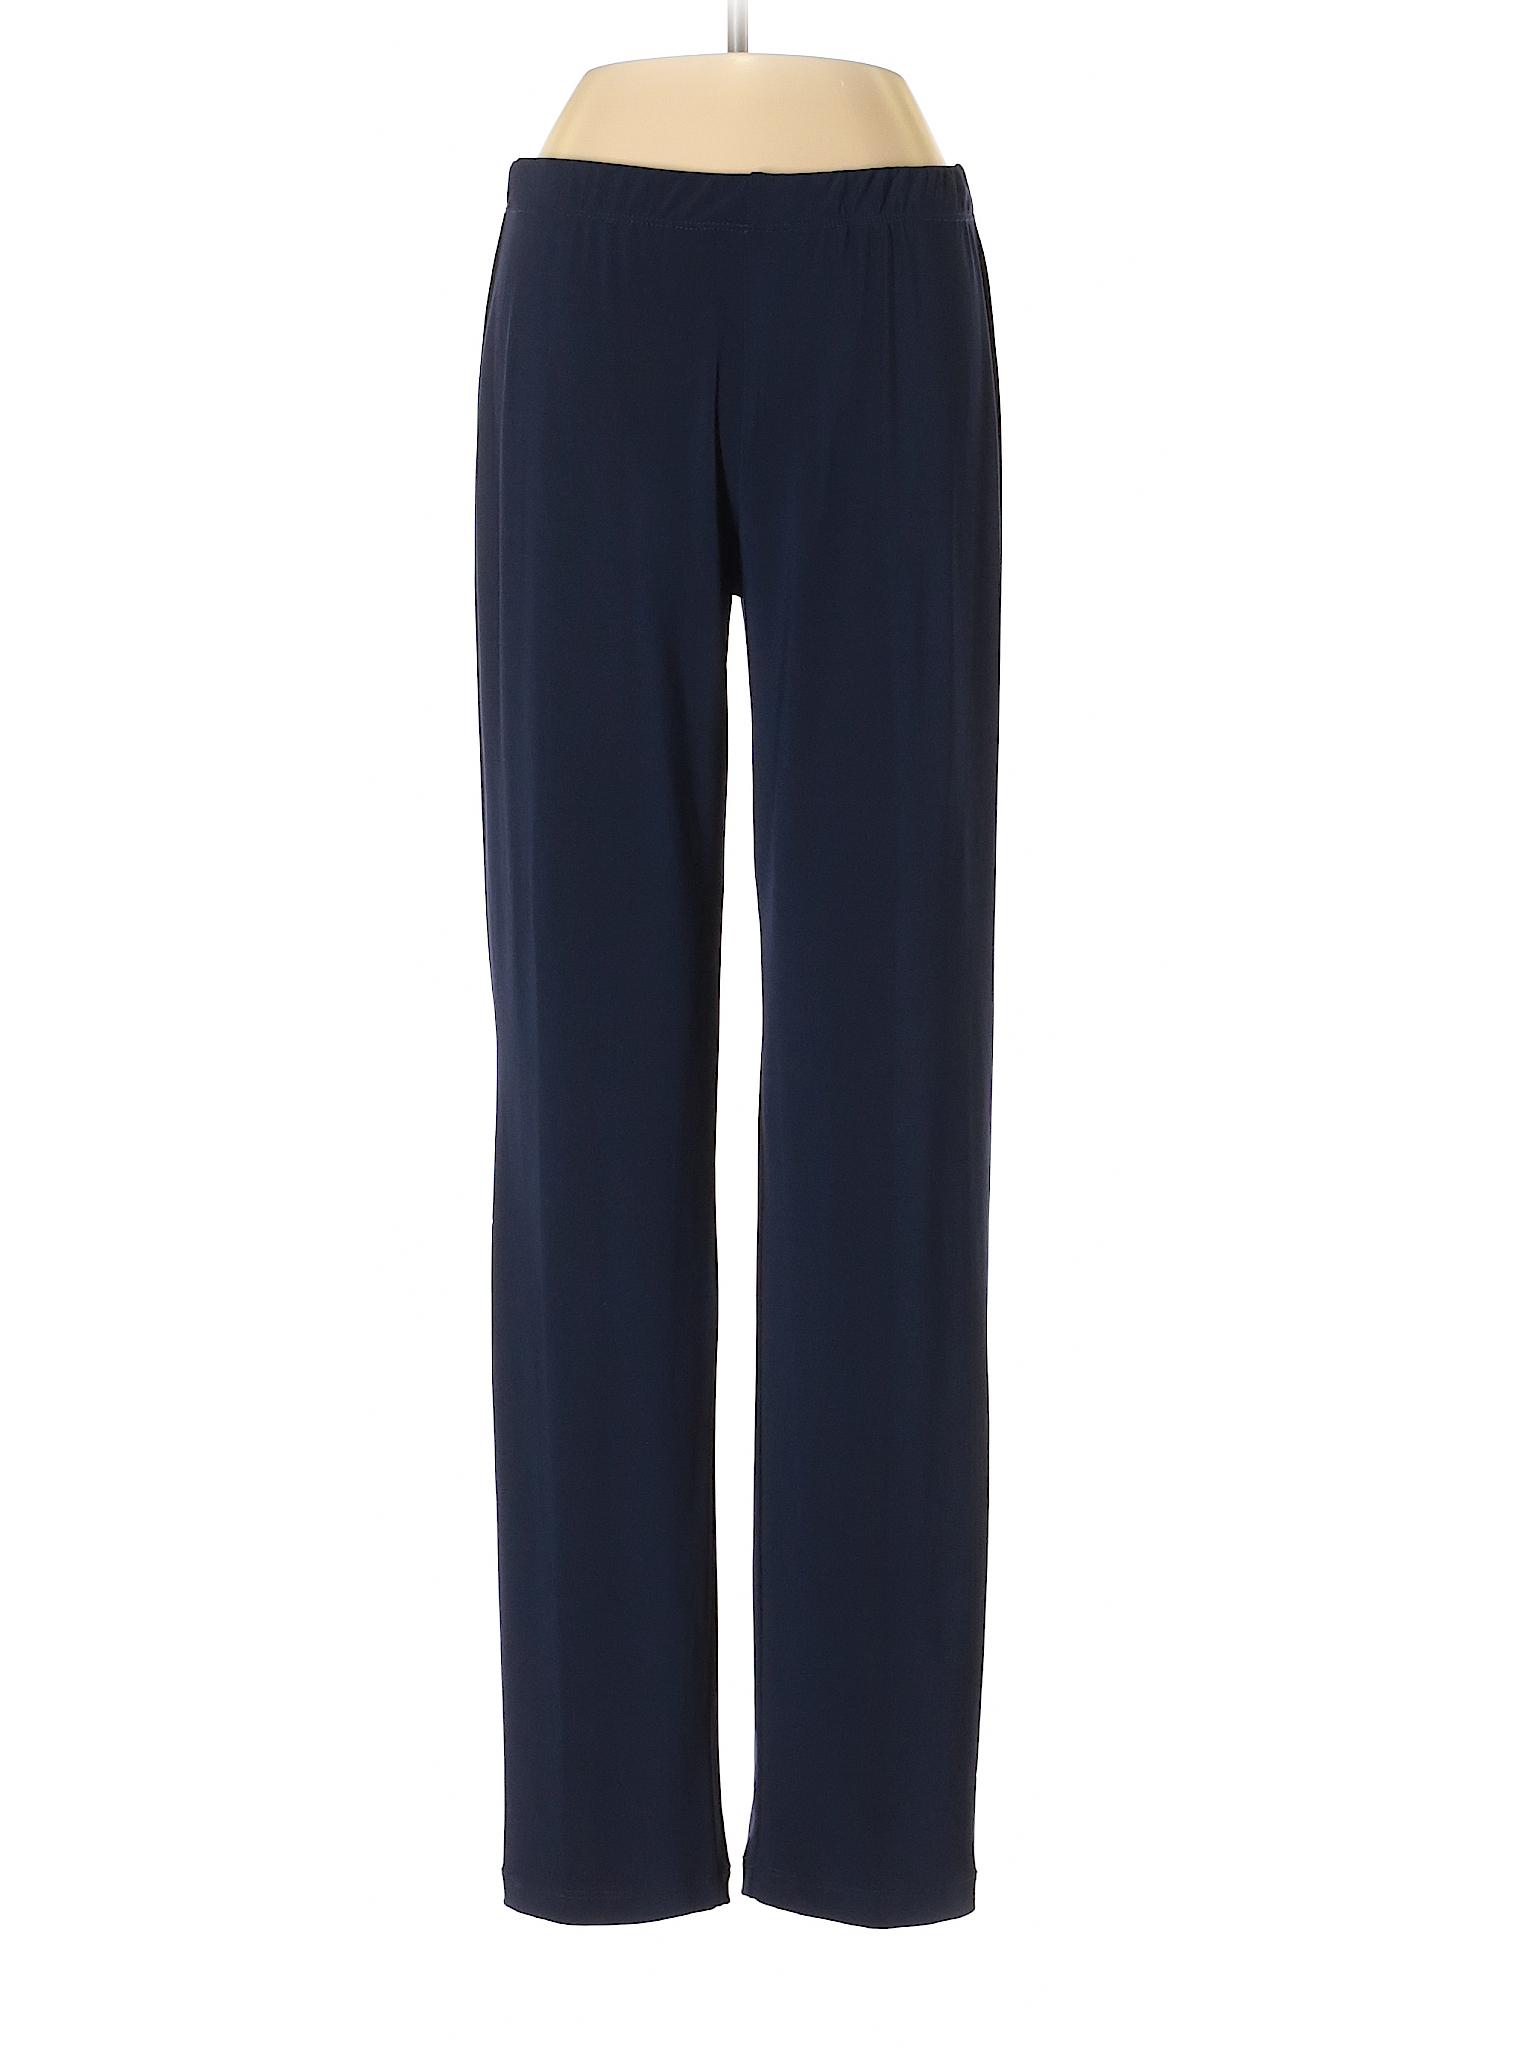 winter Woo Boutique Casual Clara Pants Sun 71P1wHqpd